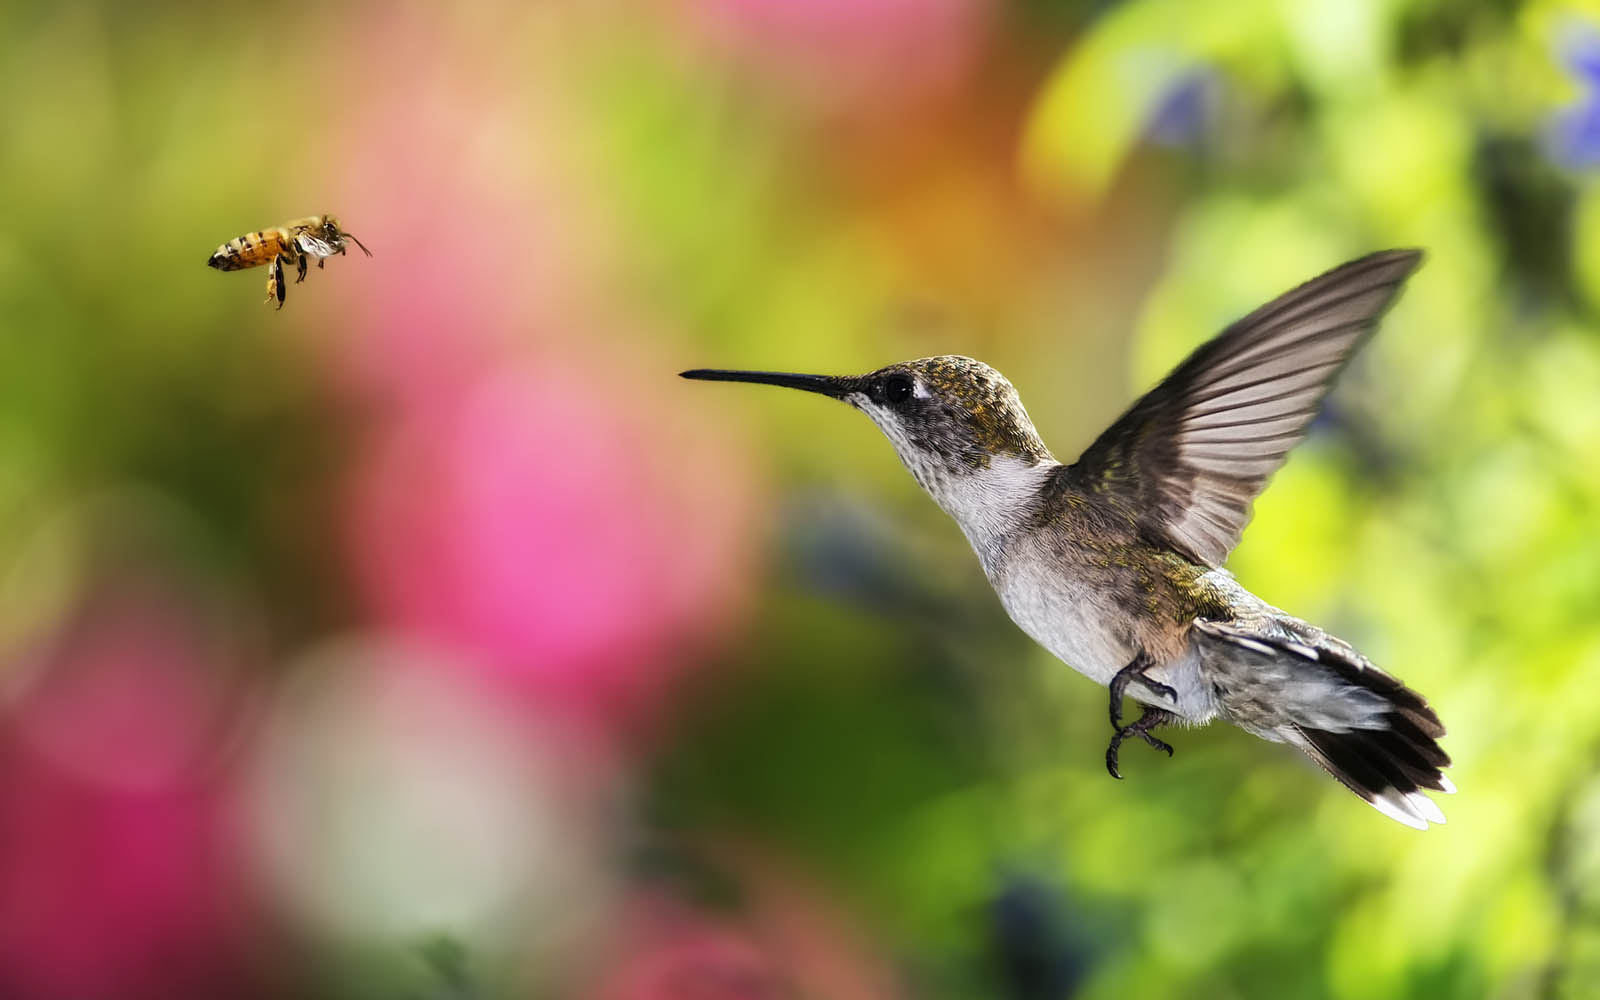 free 3d wallpapers download hummingbird wallpapers